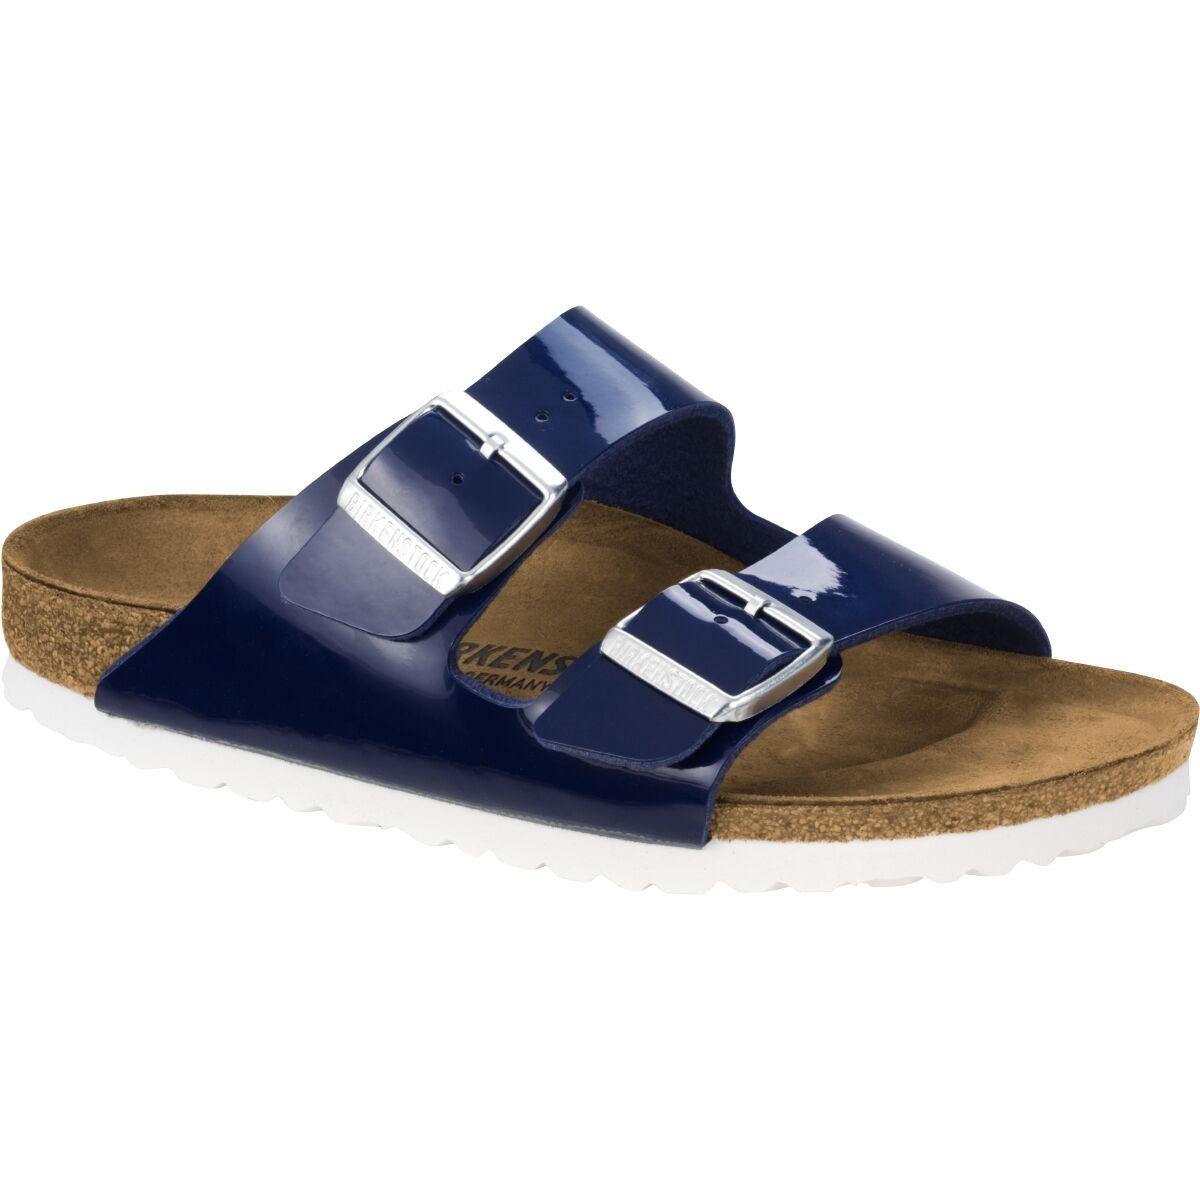 Birkenstock Sandalen Arizona Birko Flor Lack Schuhe Sandalen Birkenstock blue 1005296 Weite schmal 770fec